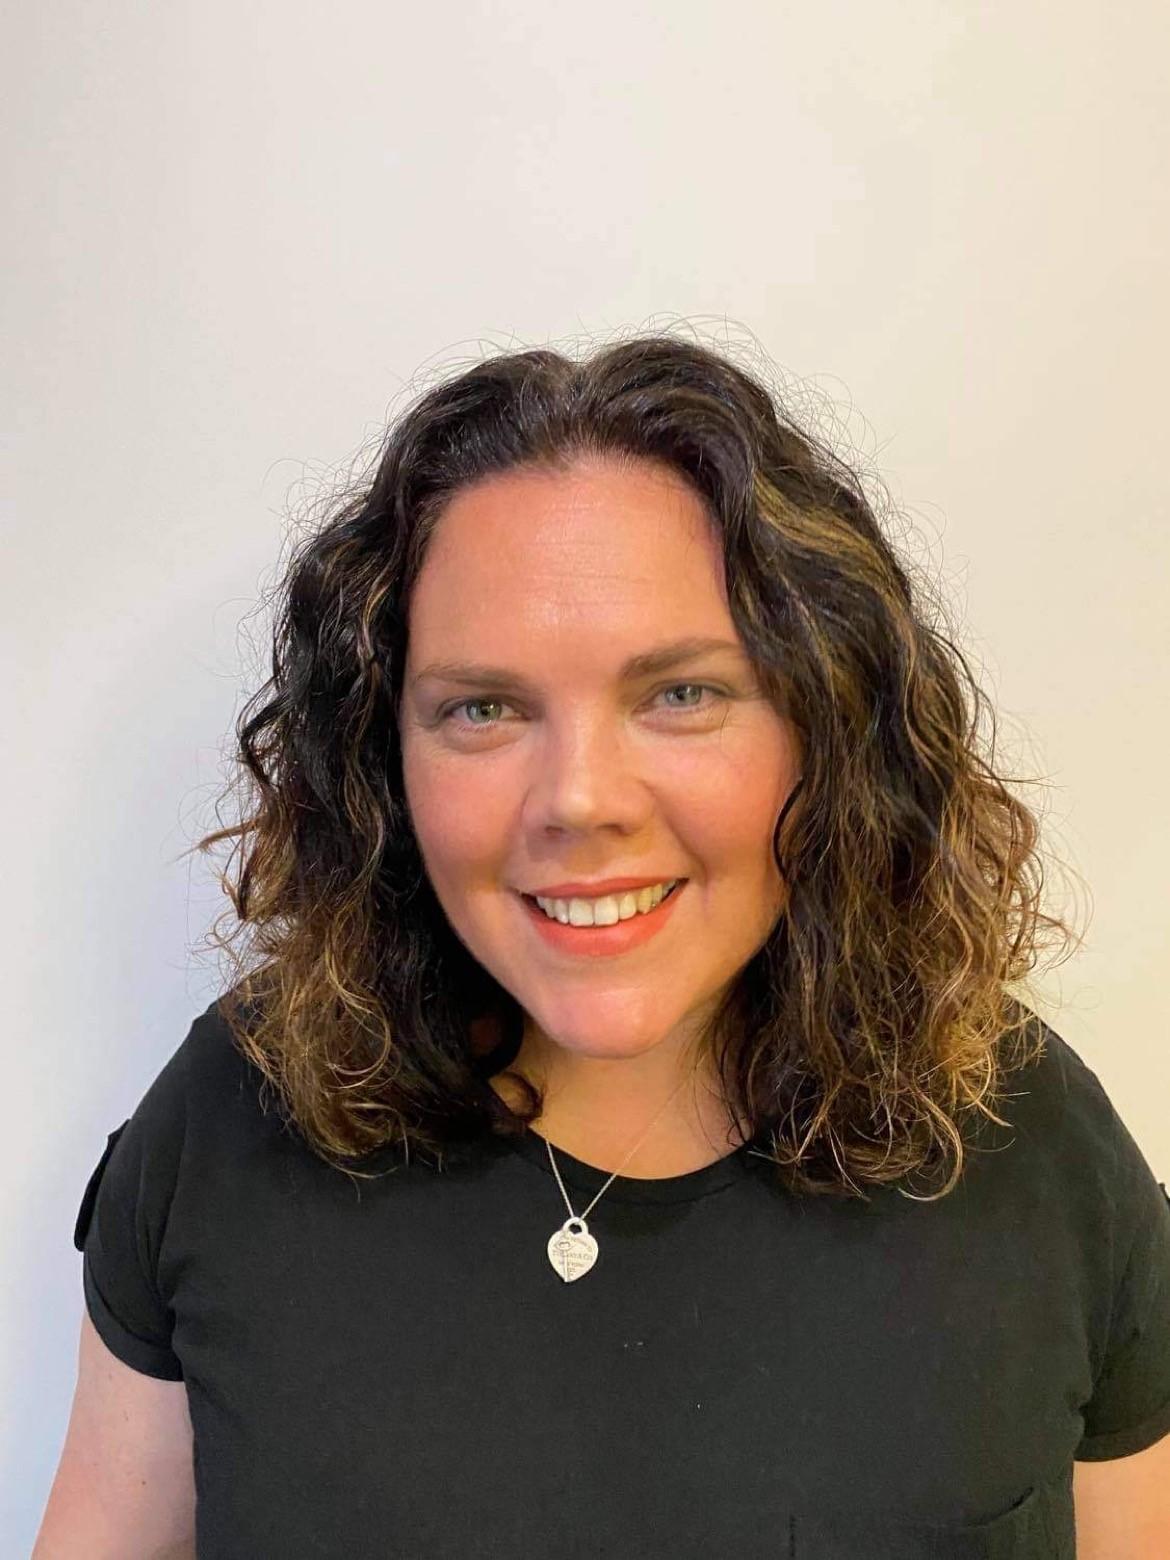 Introducing Sara Pierrepont – Millenium Sales & Project Manager